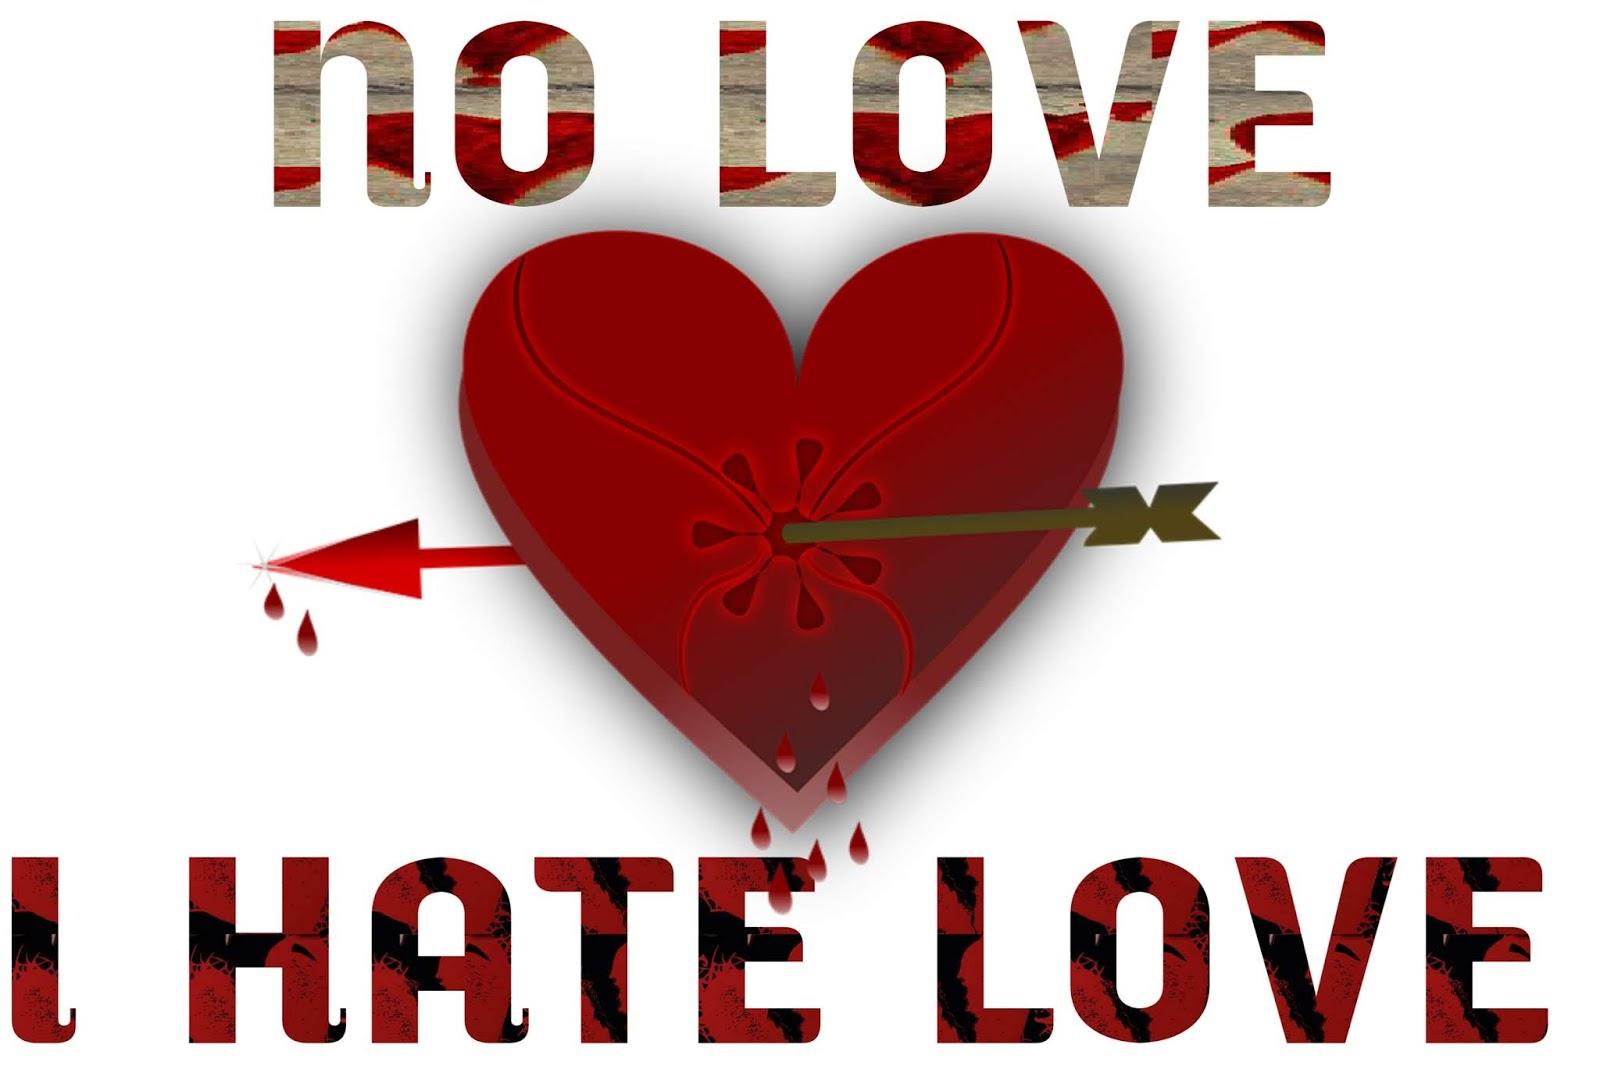 Hate Love Image, Hate Love Pic, Hate Love Photo - Heart - HD Wallpaper